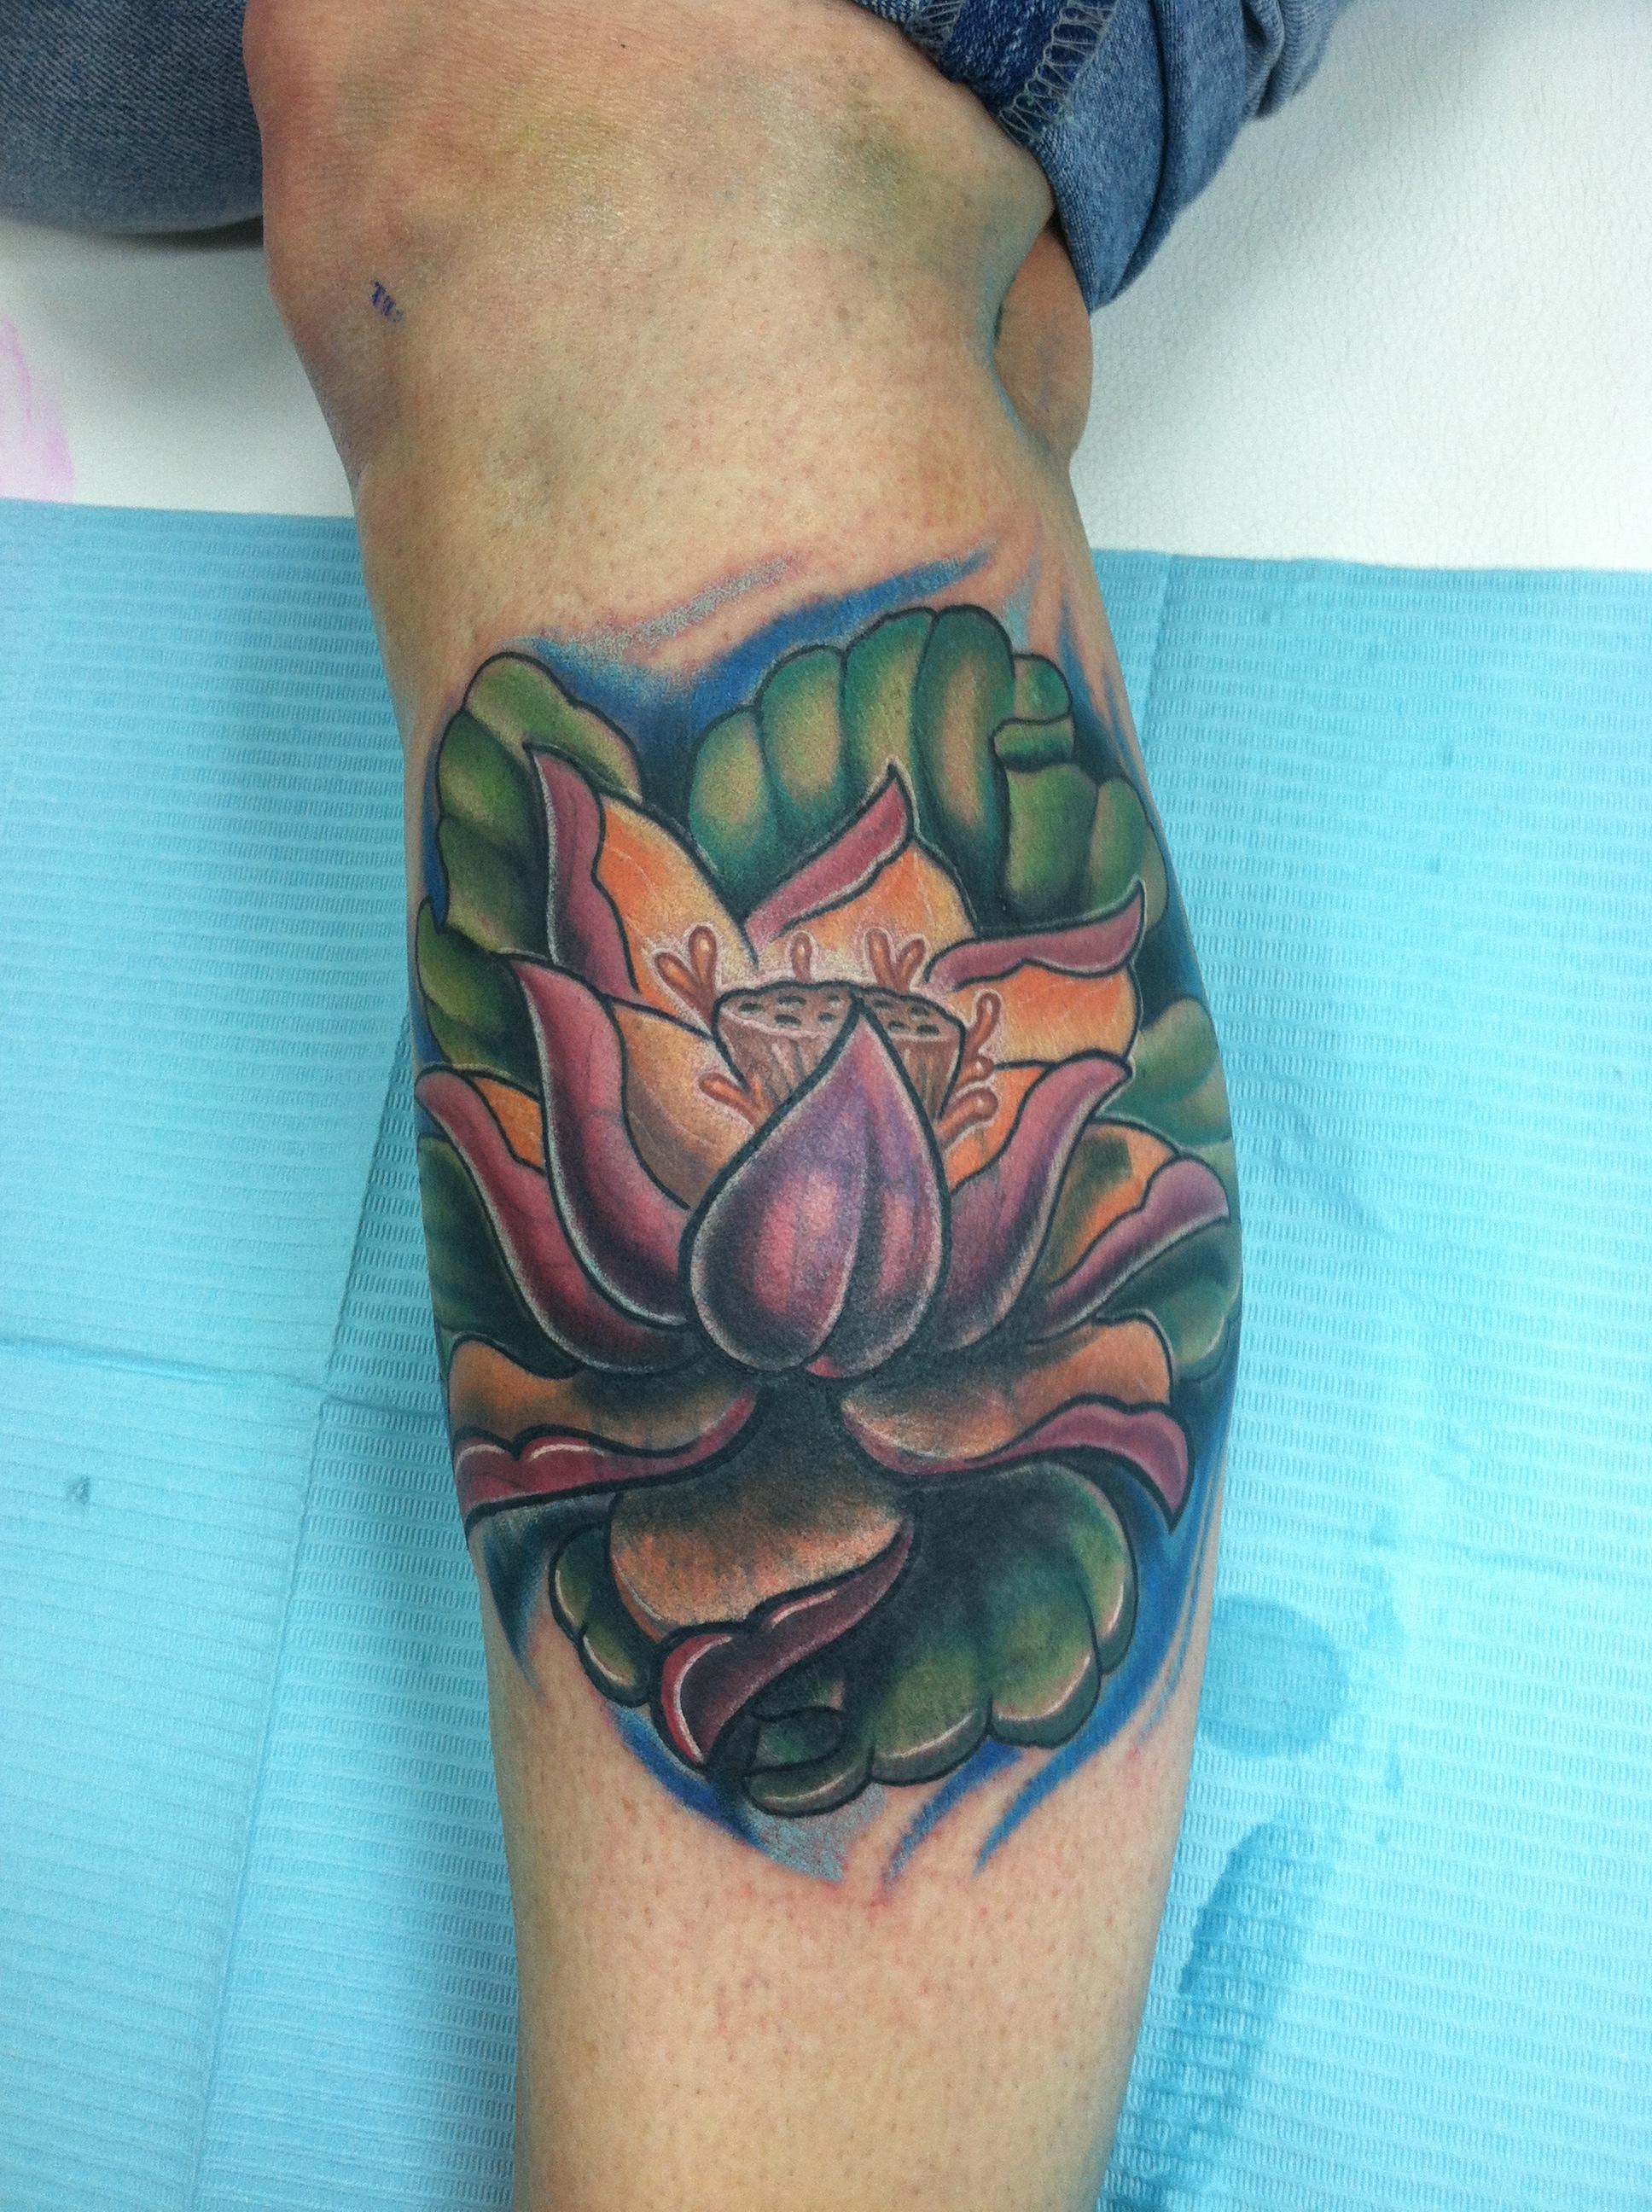 sexy_pretty_girly_custom_traditional_realistic_illustrative_lotus_flower_cover_up_color_leg_tattoo_david_meek_true_til_death_tattoo_company_ashtabula_ohio